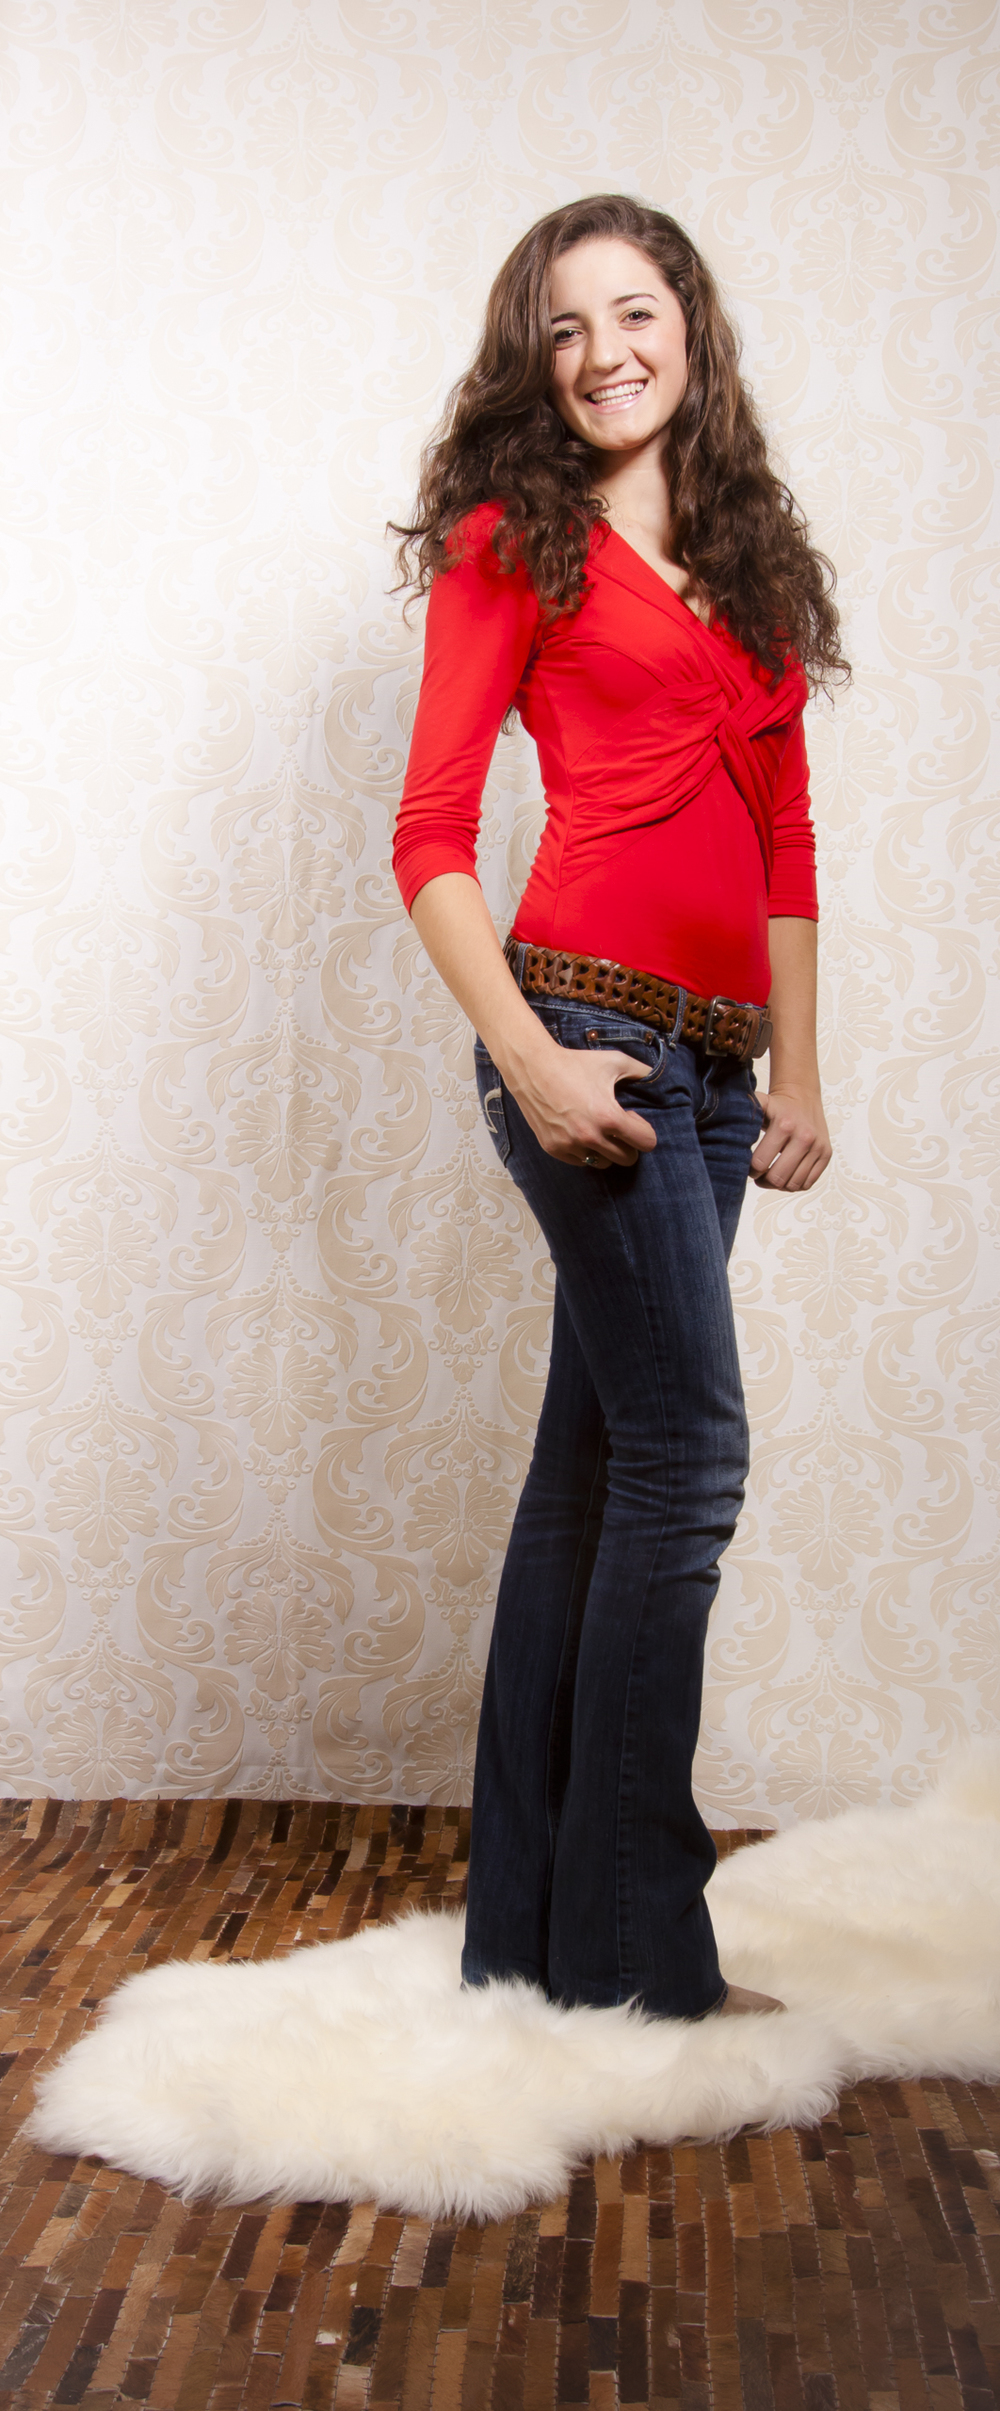 05 modern western styled senior portrait session bright red shirt leather rug 8739.jpg